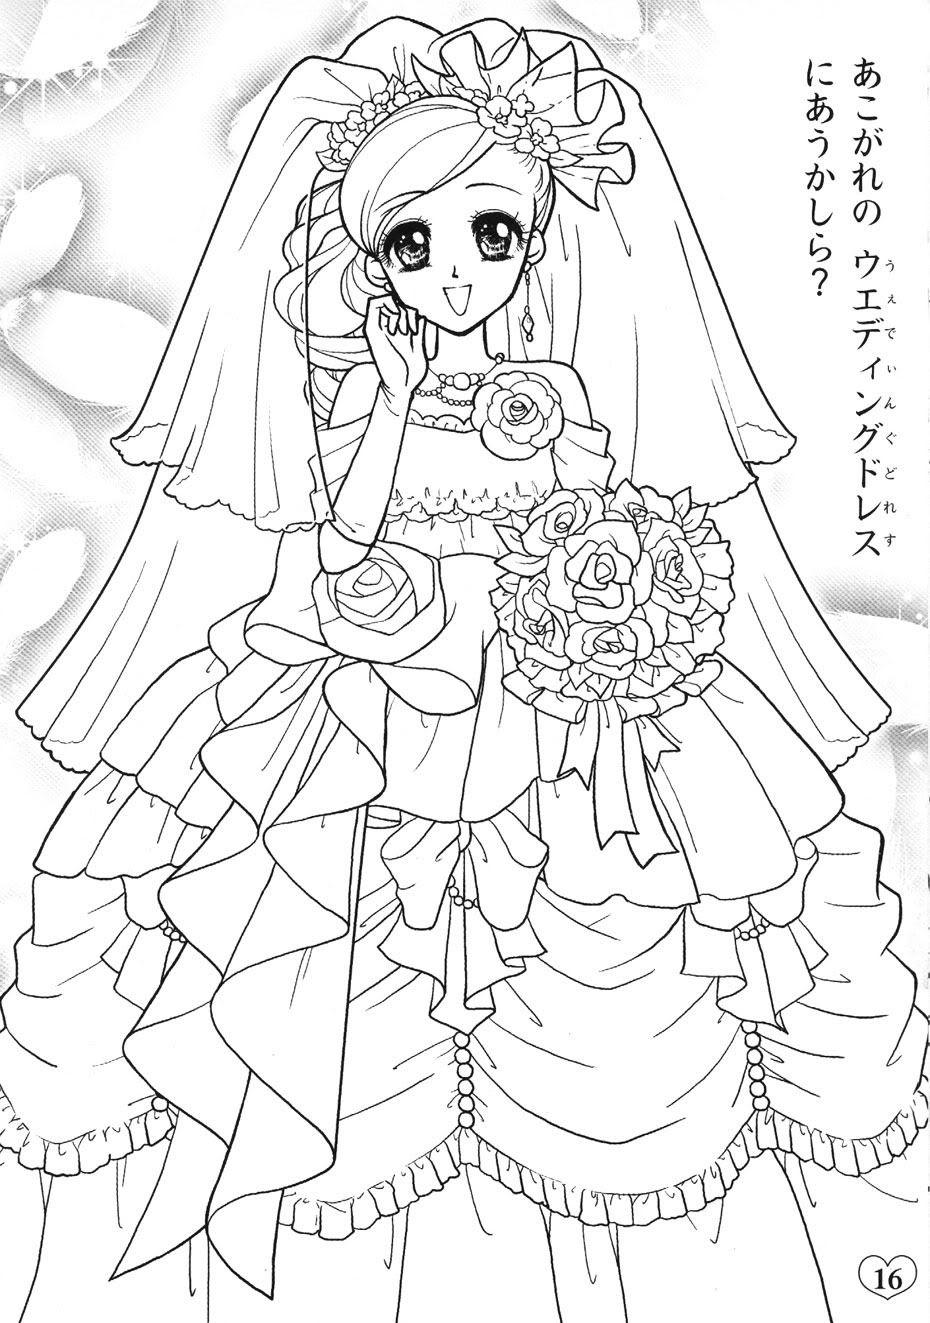 Khateerah S Image Coloring Books Fairy Coloring Book Princess Coloring